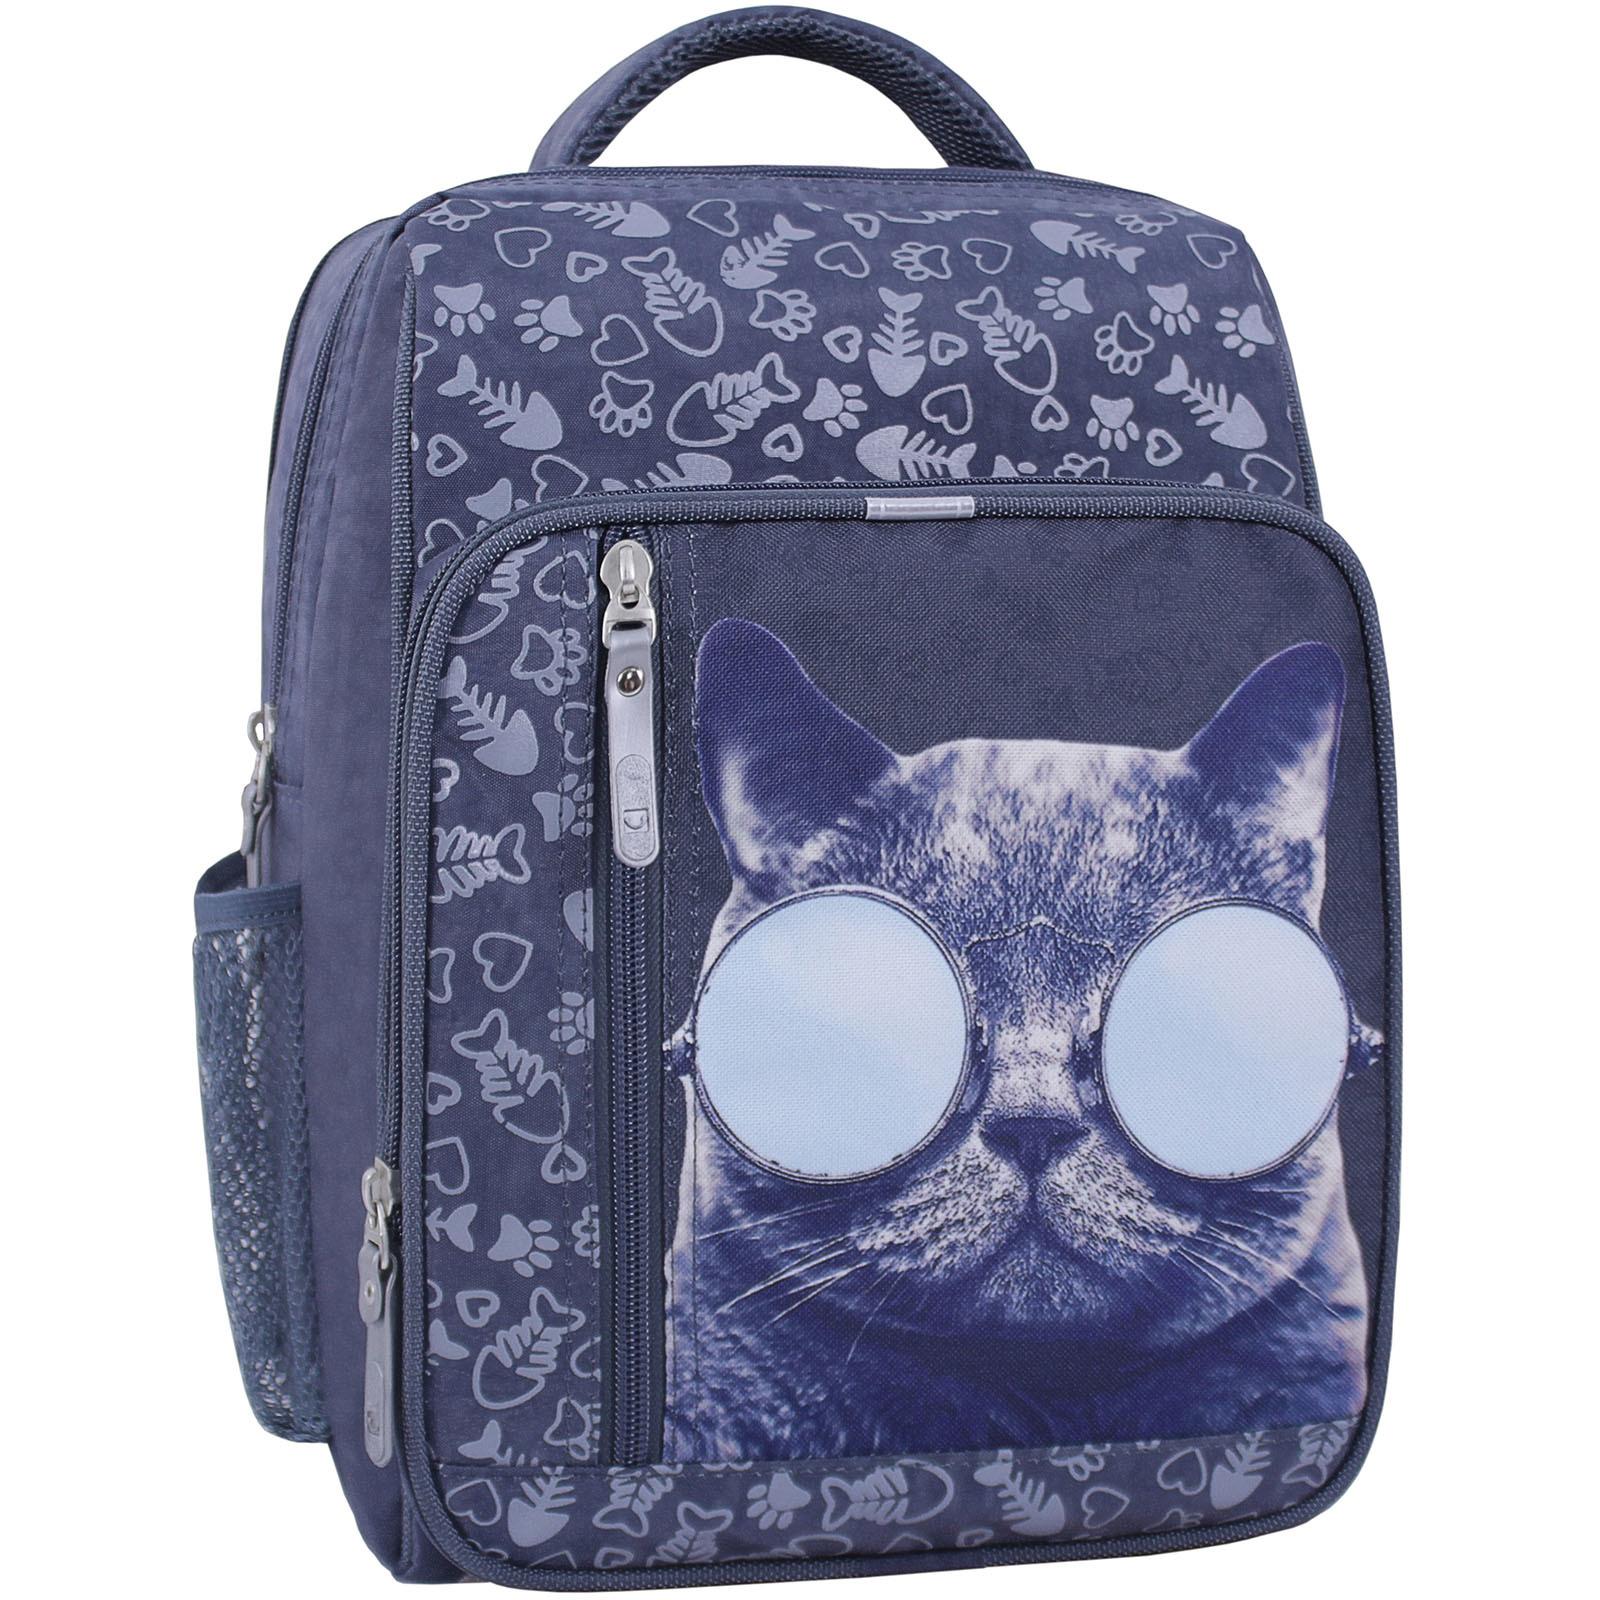 Школьные рюкзаки Рюкзак школьный Bagland Школьник 8 л. 321 серый 611 (0012870) IMG_0957_суб.611_.JPG